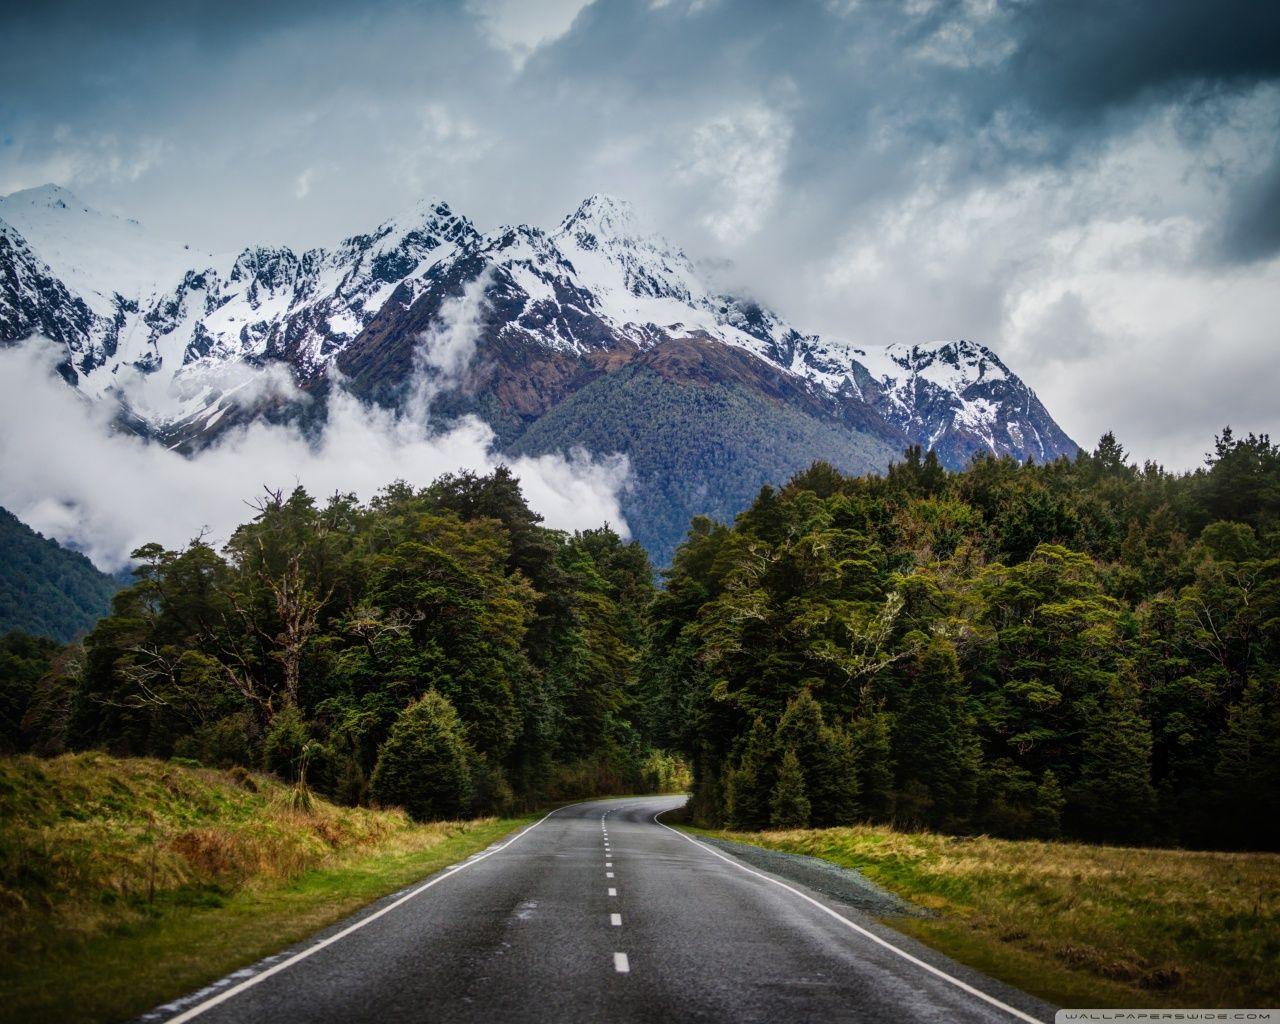 Mountain Free Wallpaper Hub The Mountain Road Wallpaper